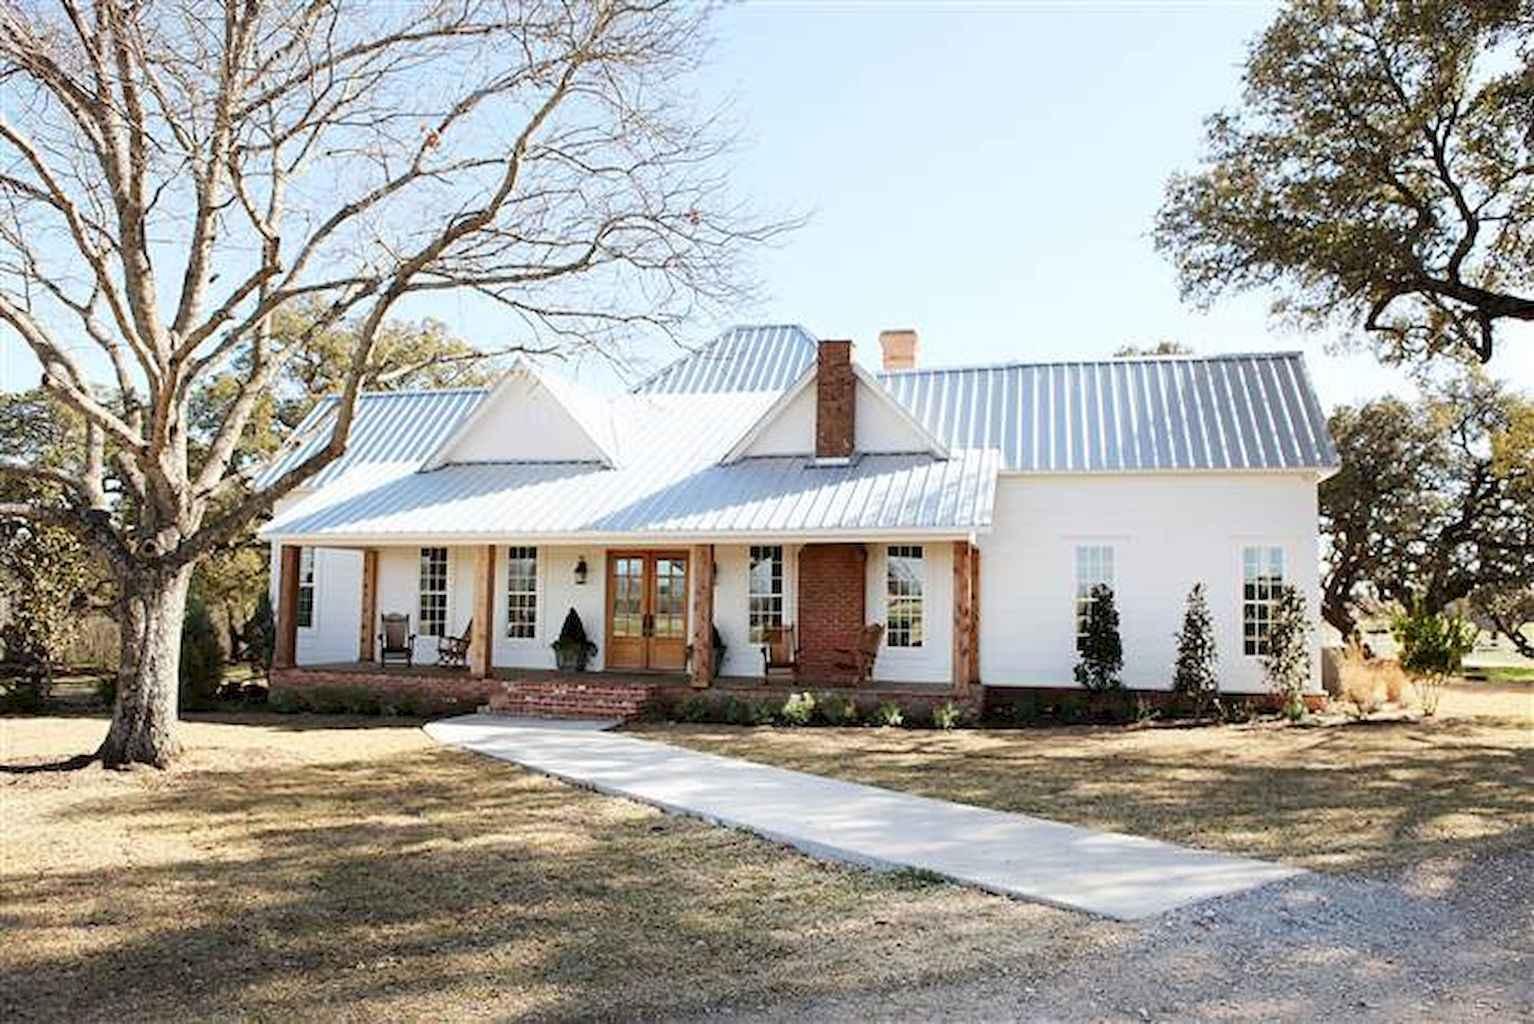 80 Amazing Plantation Homes Farmhouse Design Ideas (39)